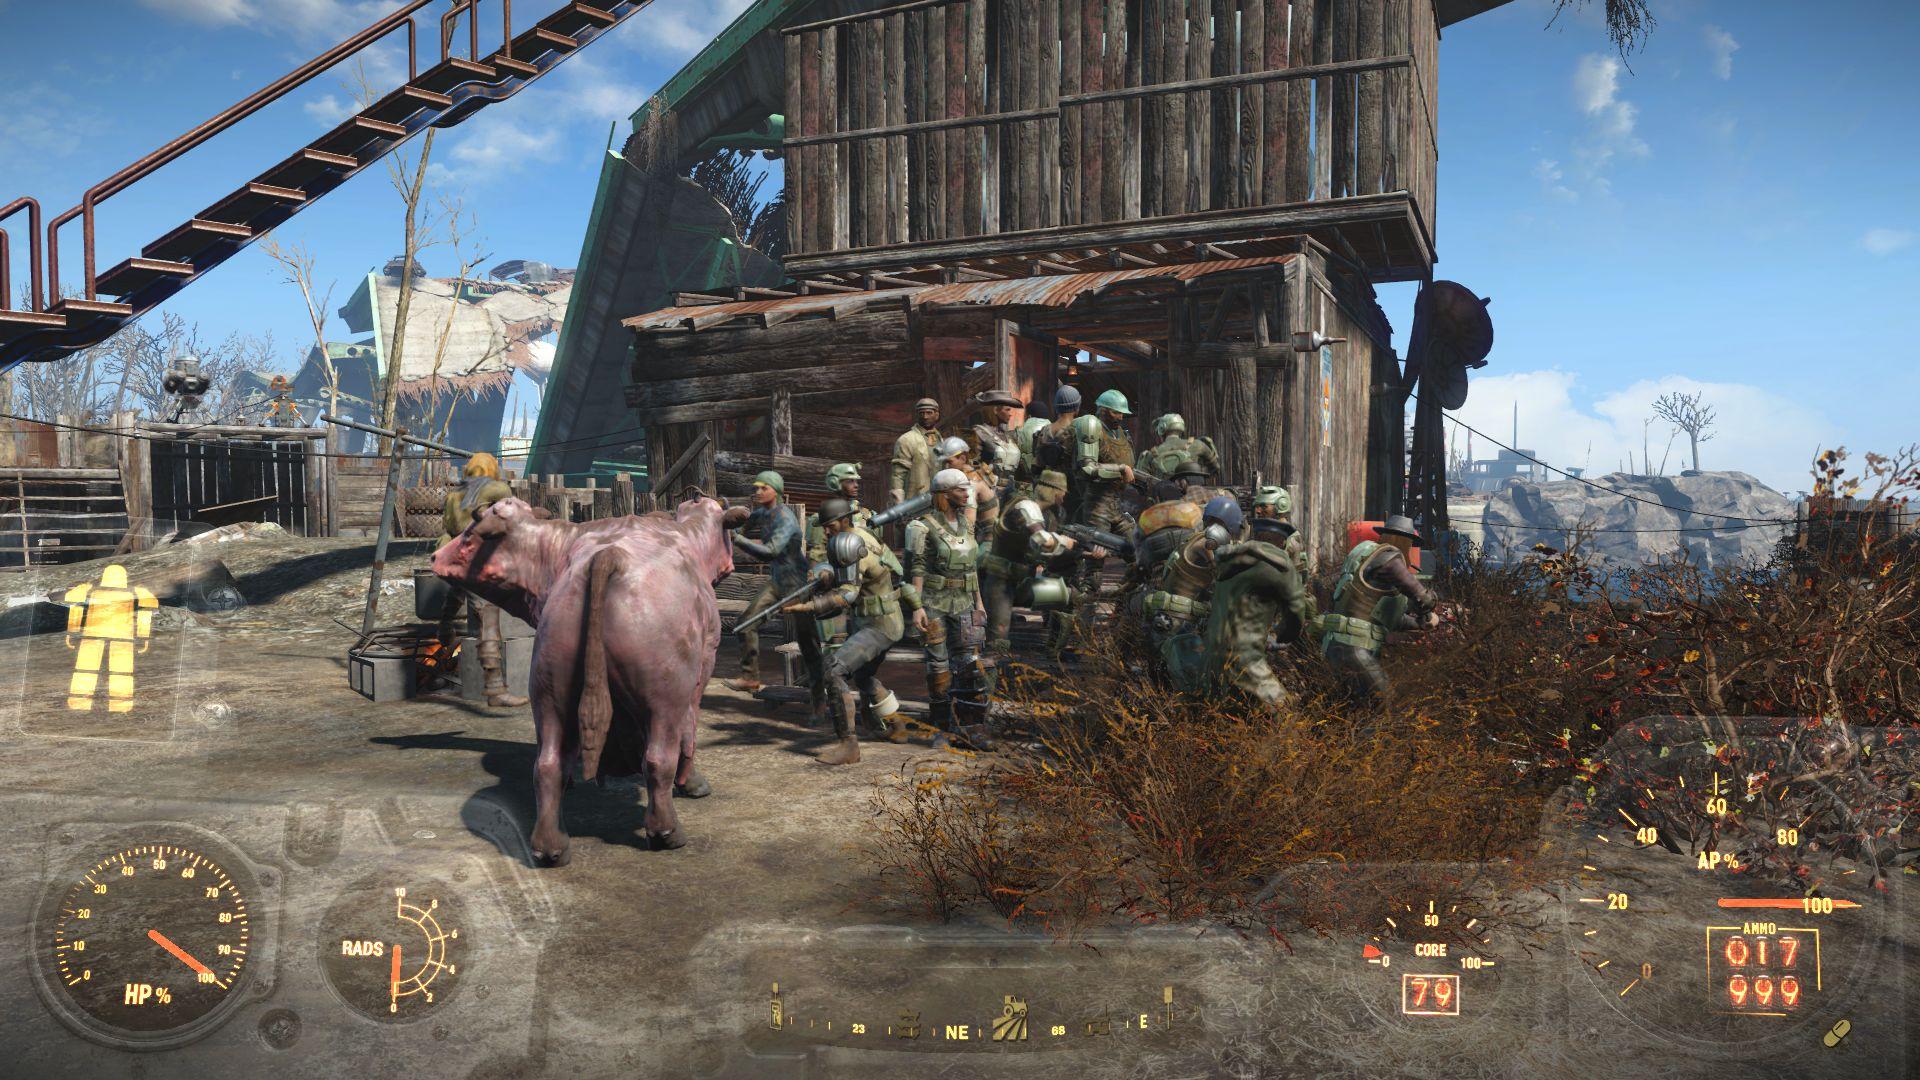 Защита дома идет успешно :) - Fallout 4 брамин, защита, поселенцы, Ферма Финча